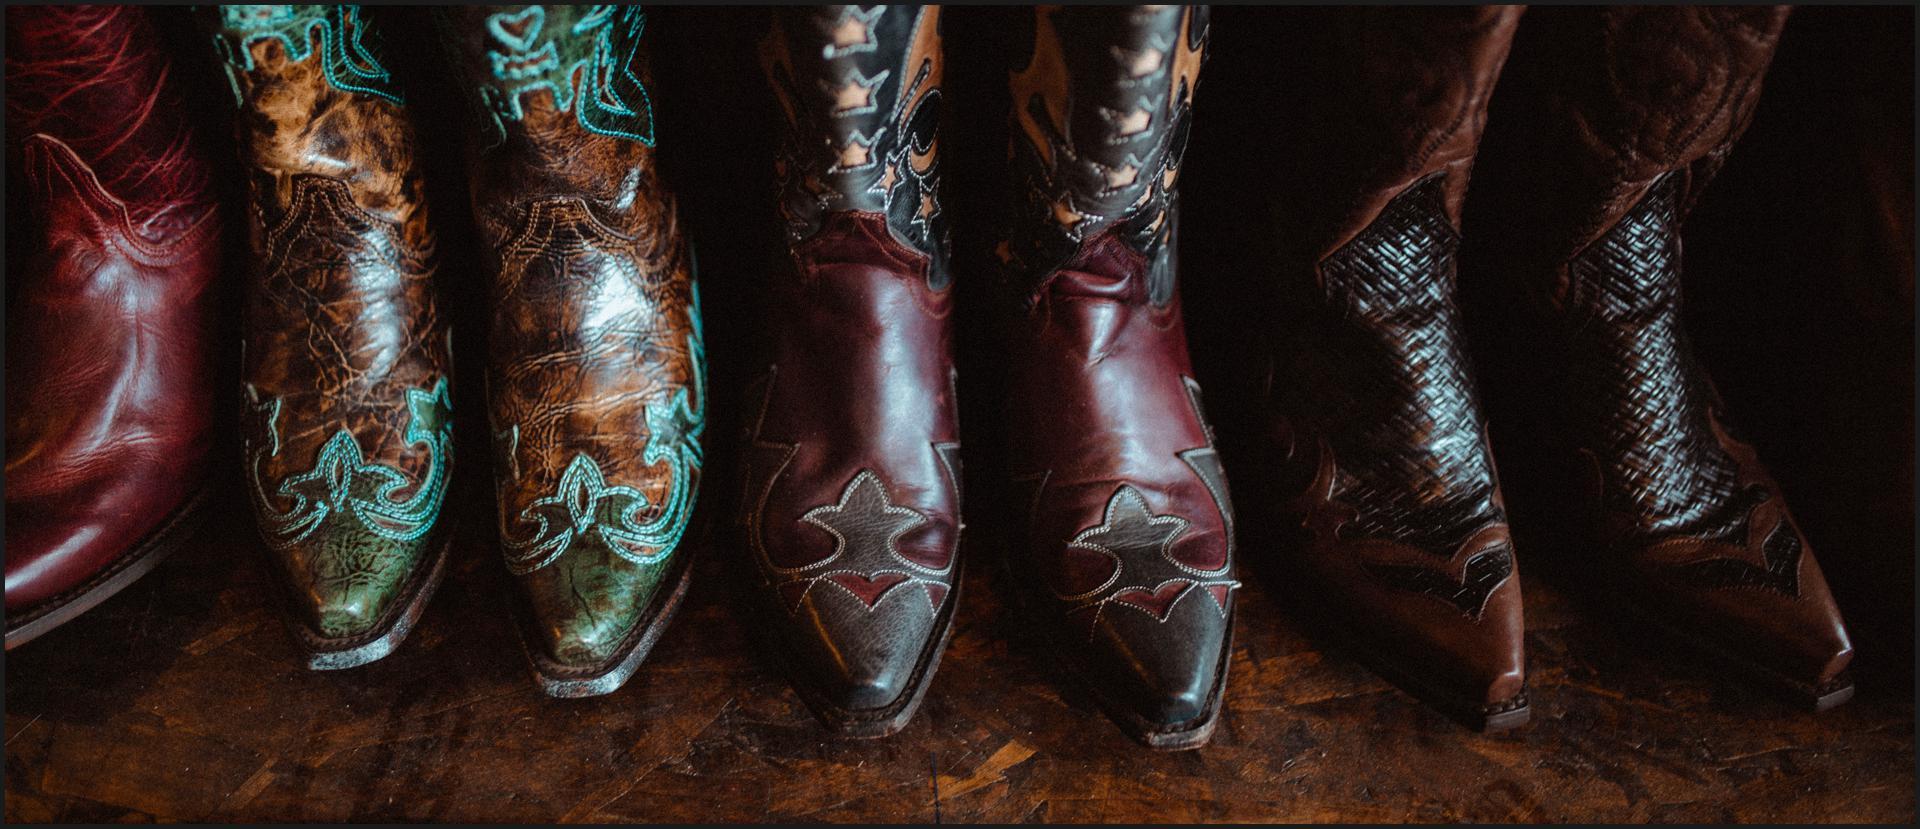 california, road trip, boots